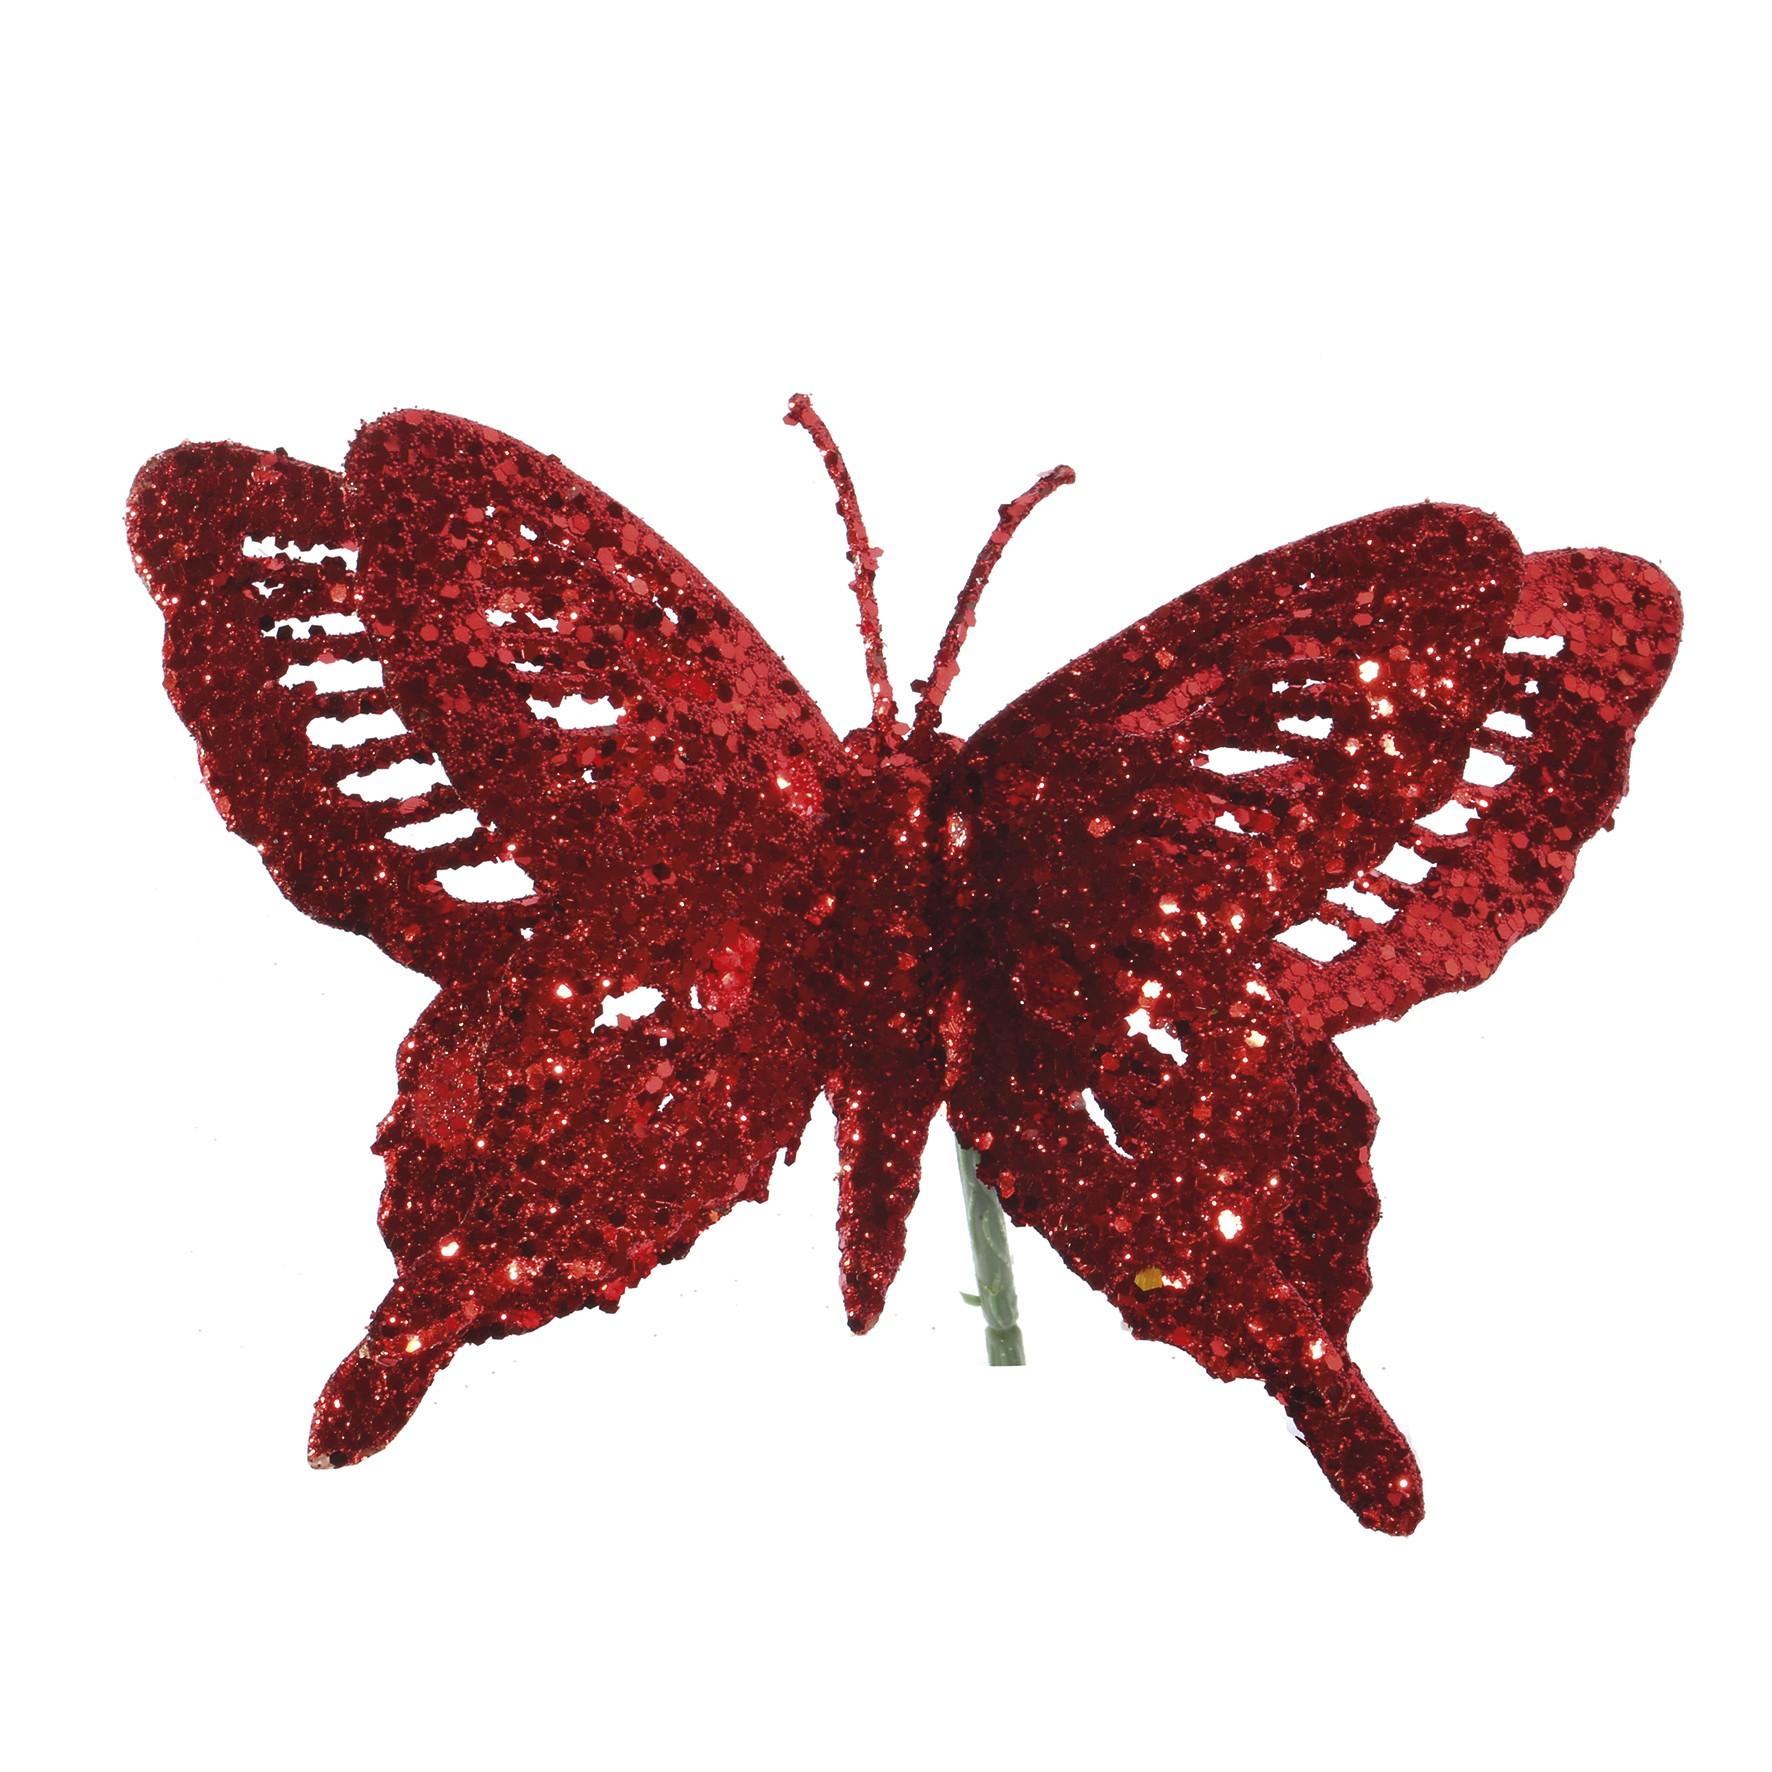 Enfeite Natalino Borboleta 23 cm Vermelho - 20205 - Yangzi